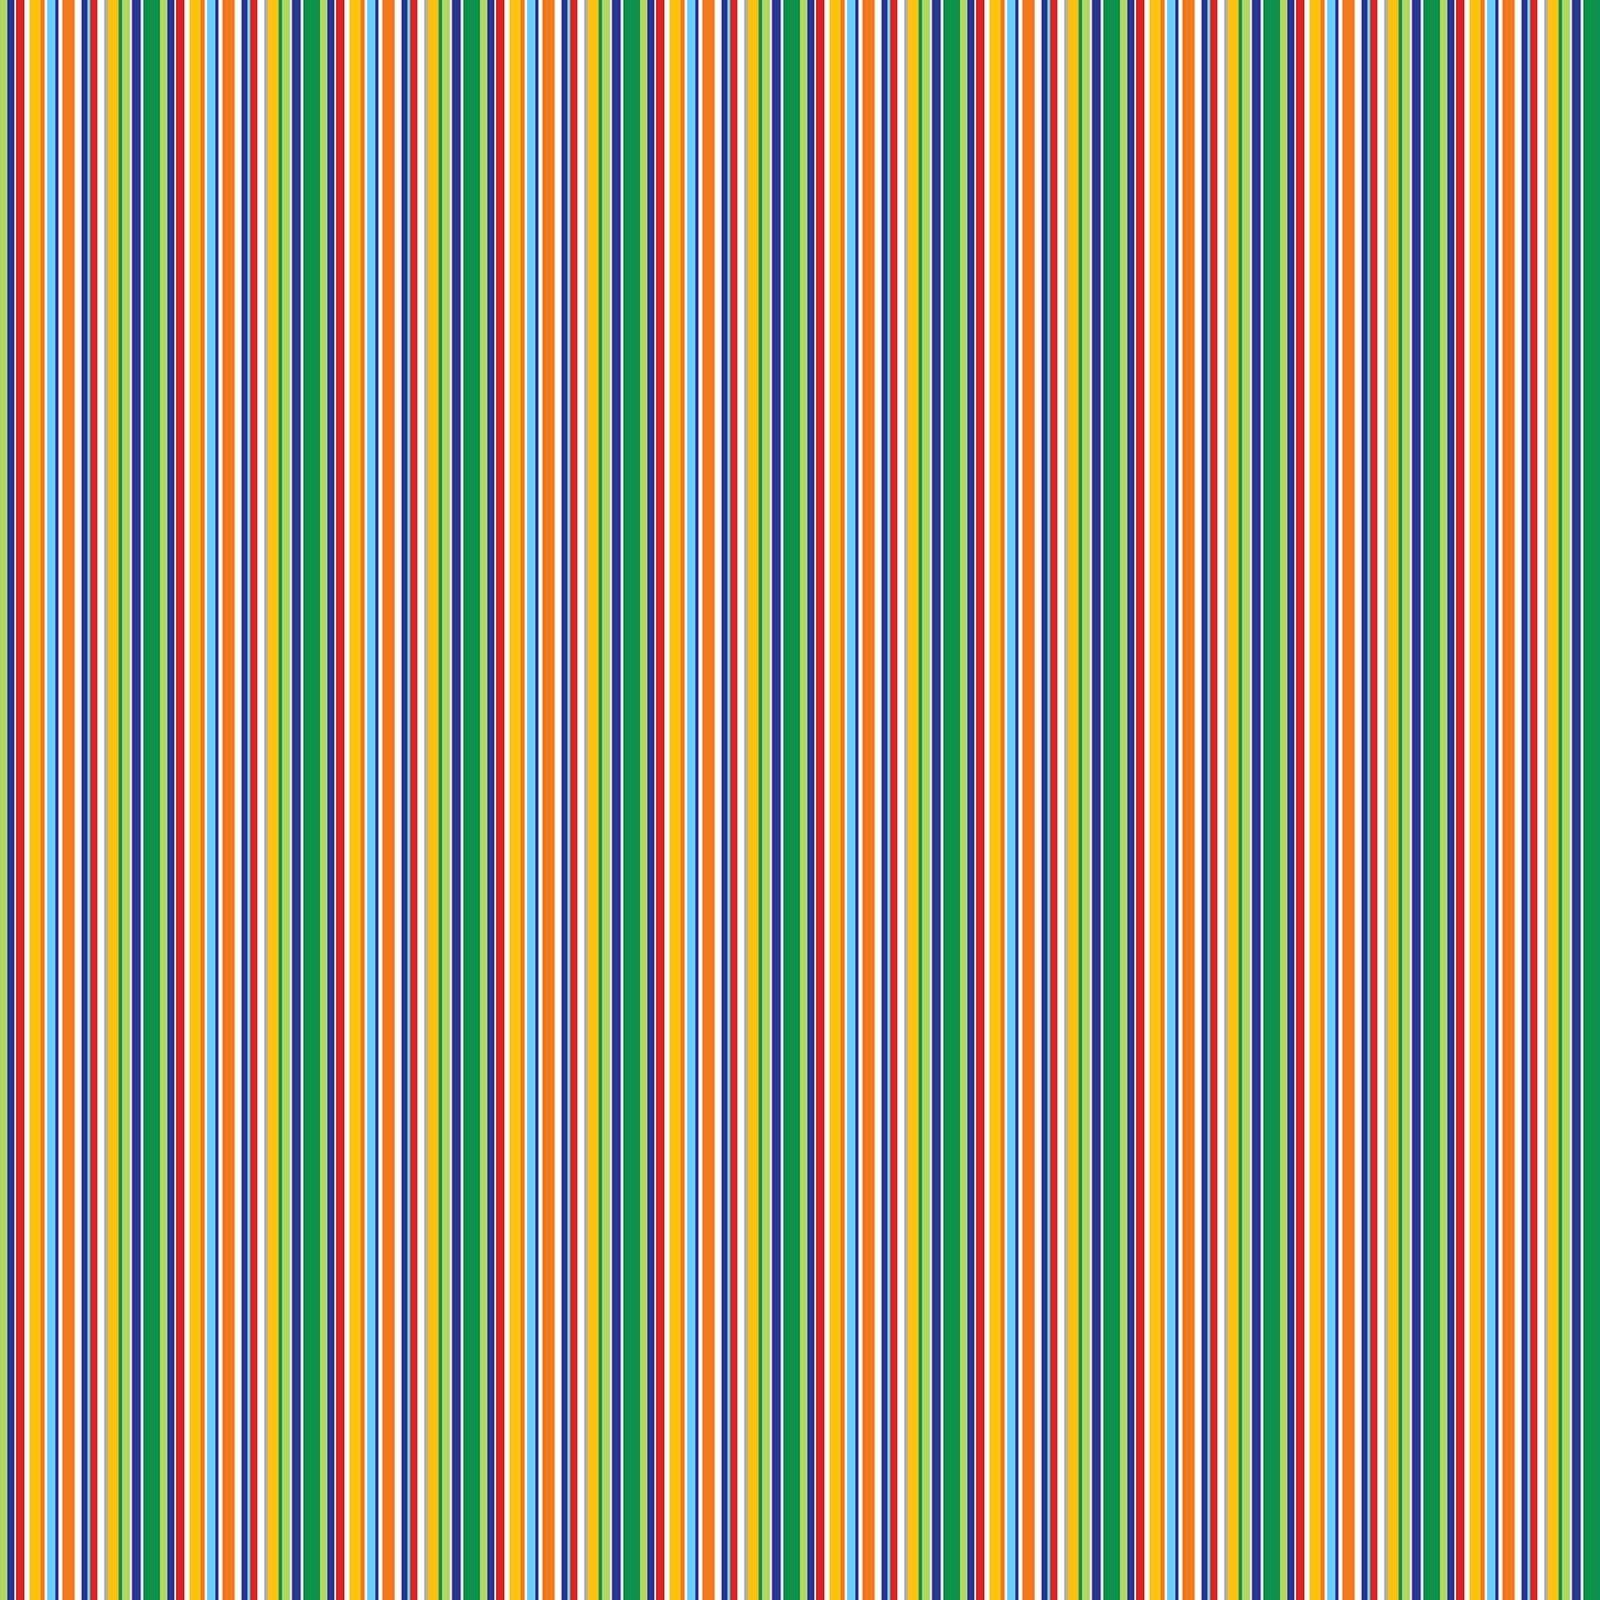 All Around Town - Barcode Stripe